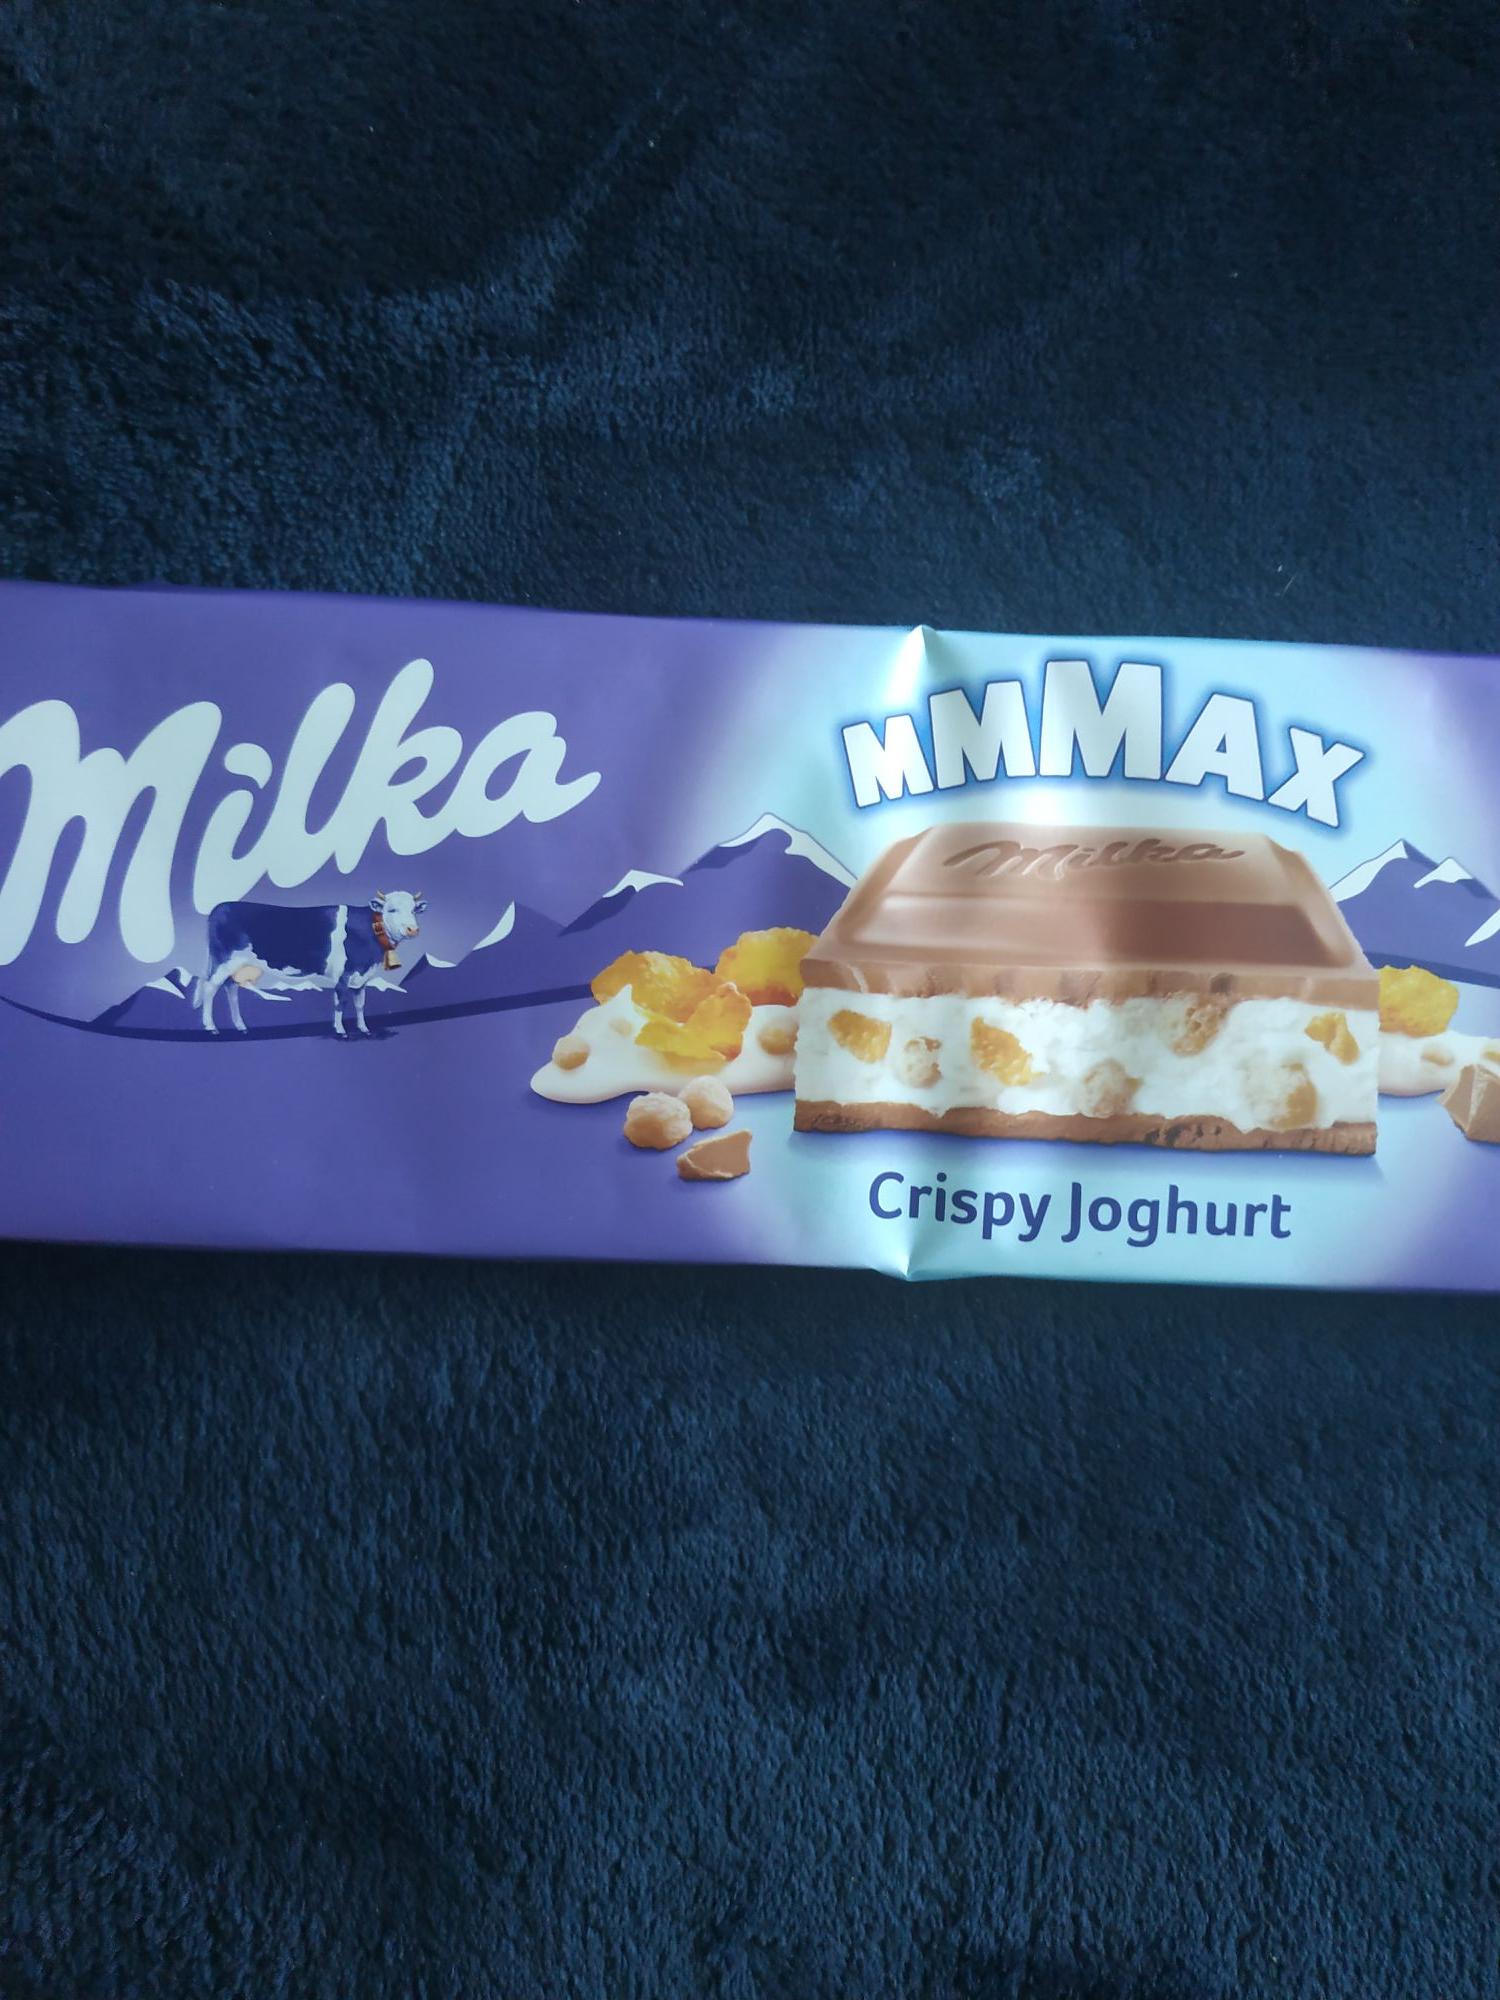 Milka Cripsy Joghurt 300g - TESCO SZCZECIN